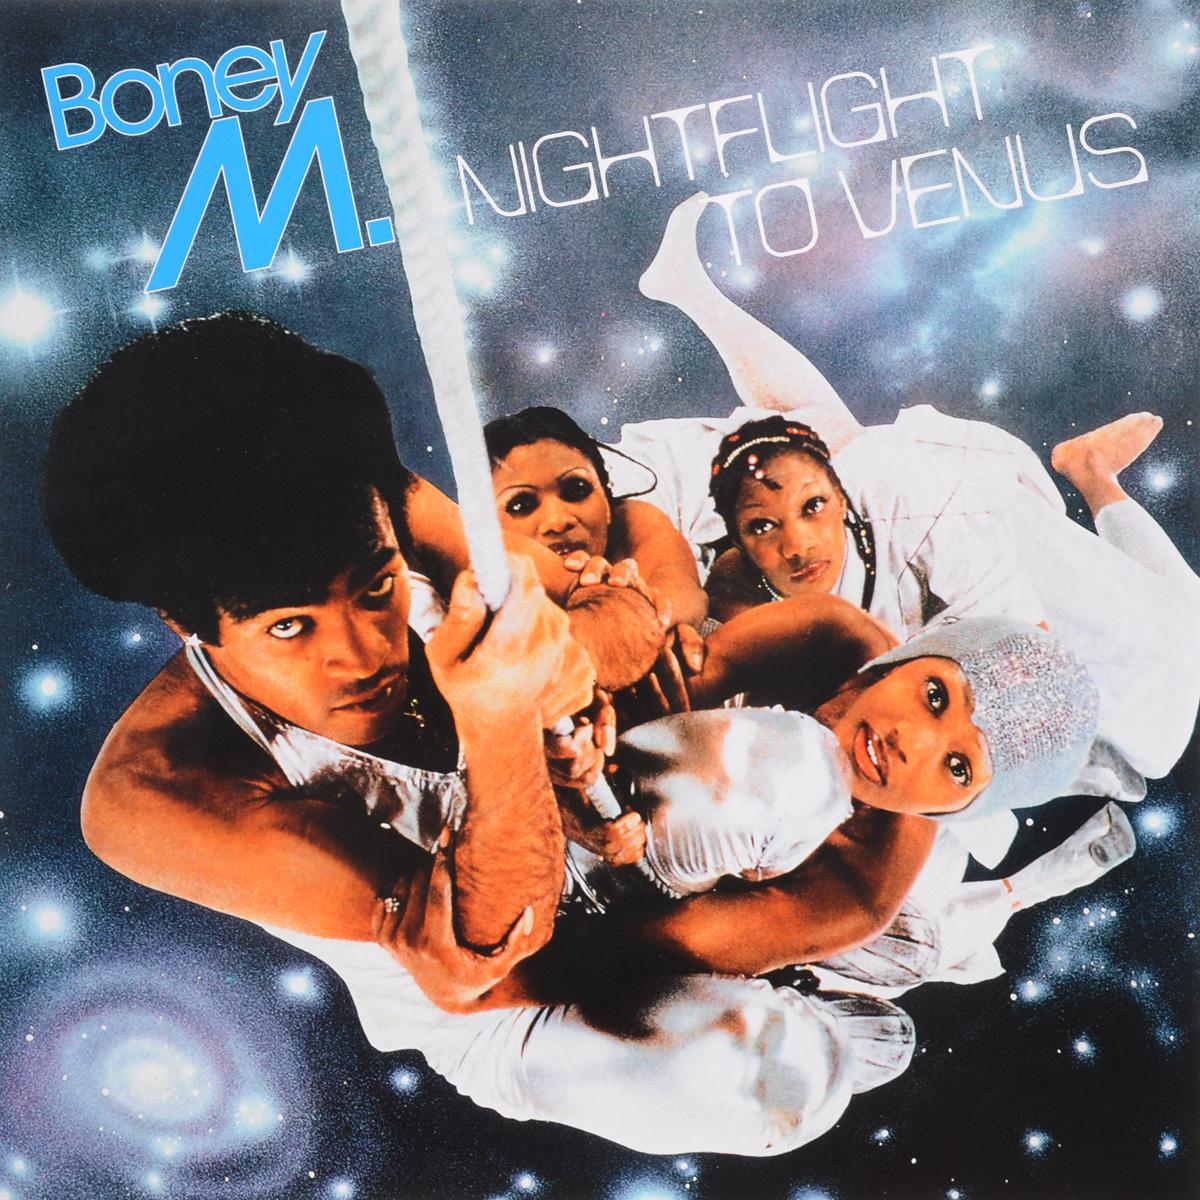 Boney M Boney M. Nightflight To Venus (LP) boney m nightflight to venus